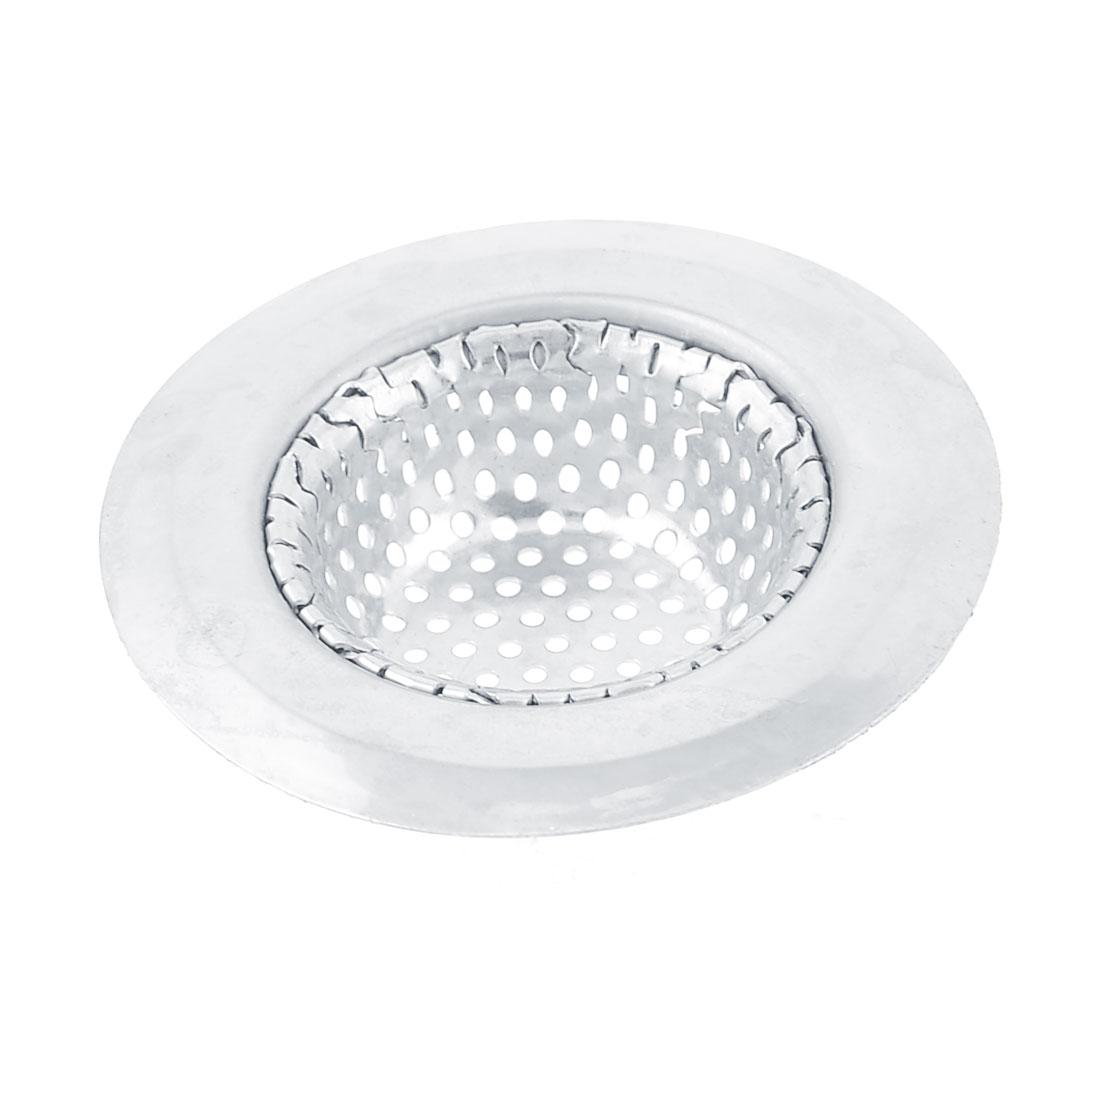 Home Washroom Stainless Steel Basket Drain Sink Strainer